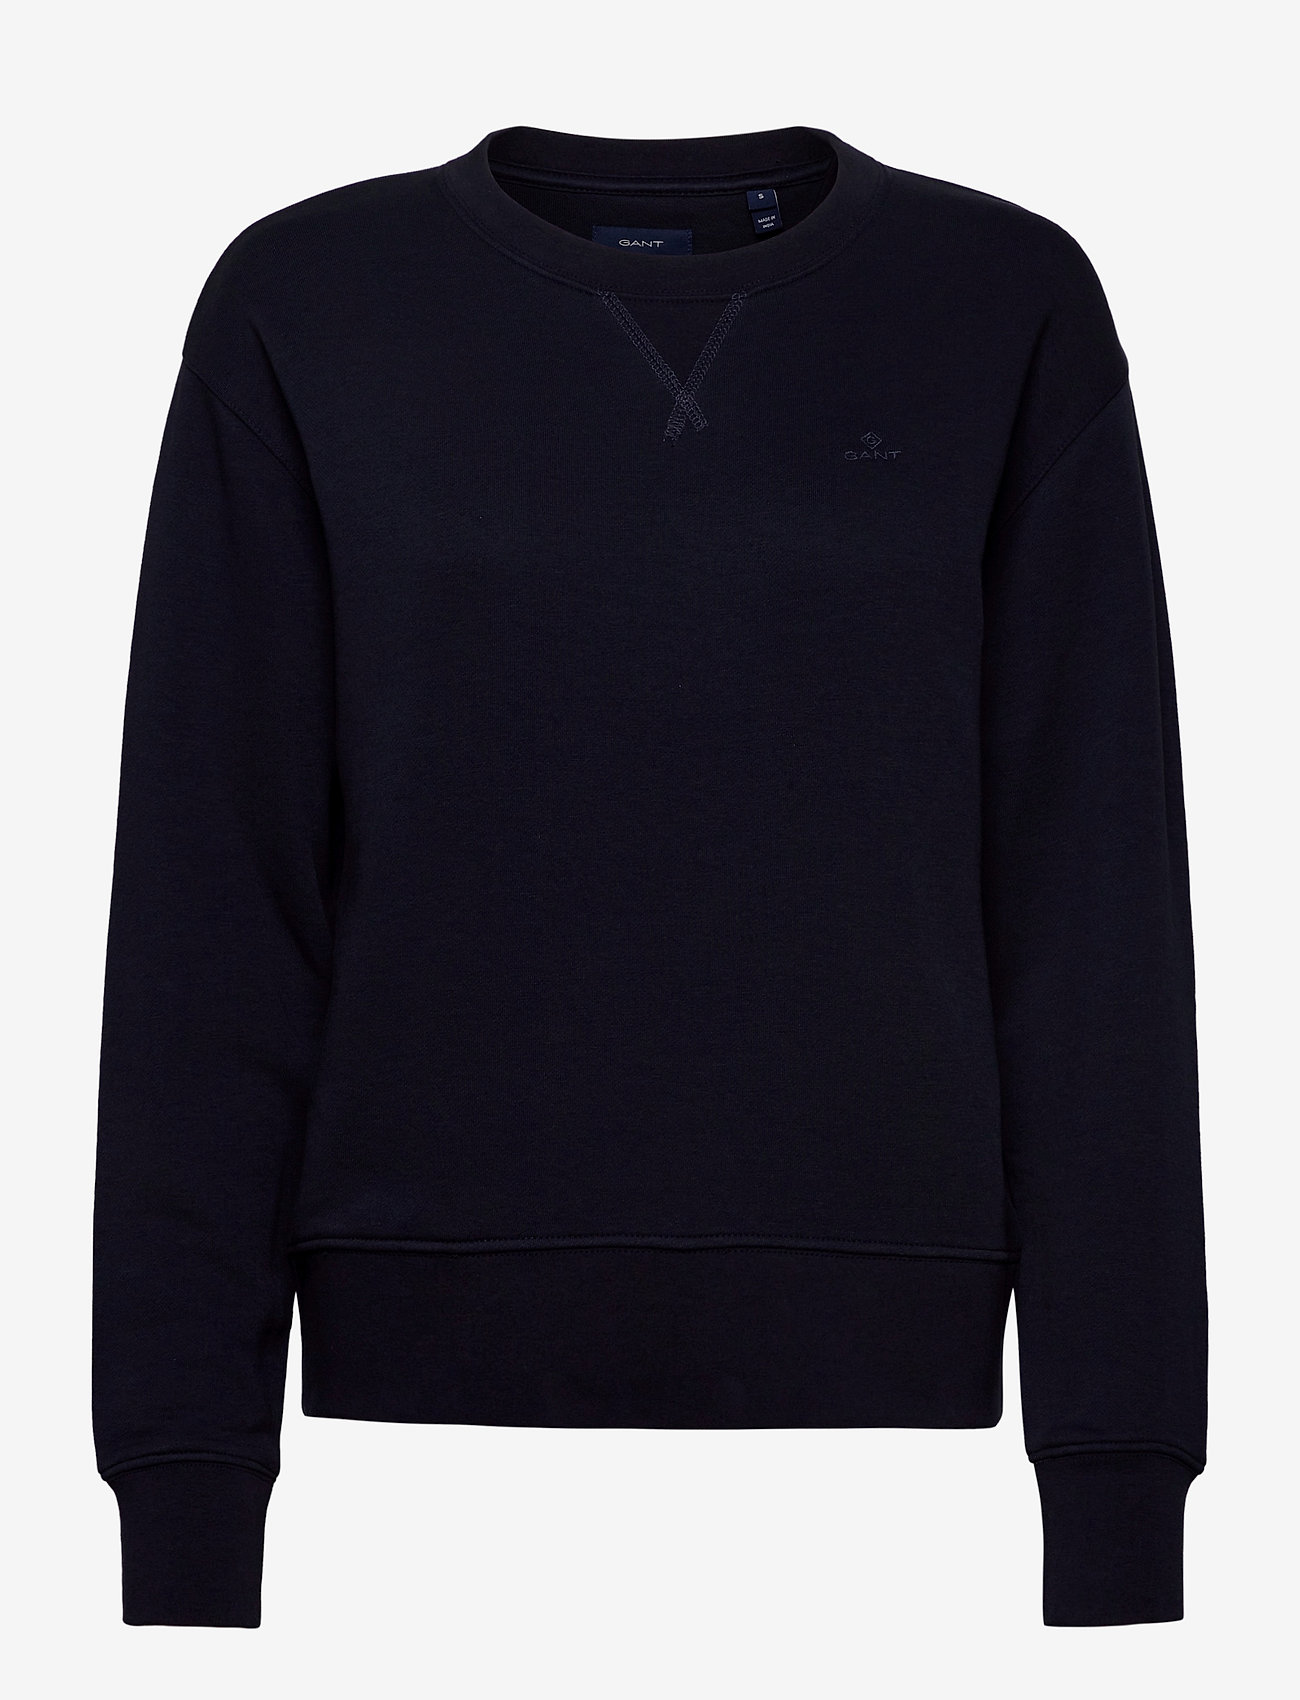 GANT - ORIGINAL C-NECK SWEAT - sweatshirts - evening blue - 0